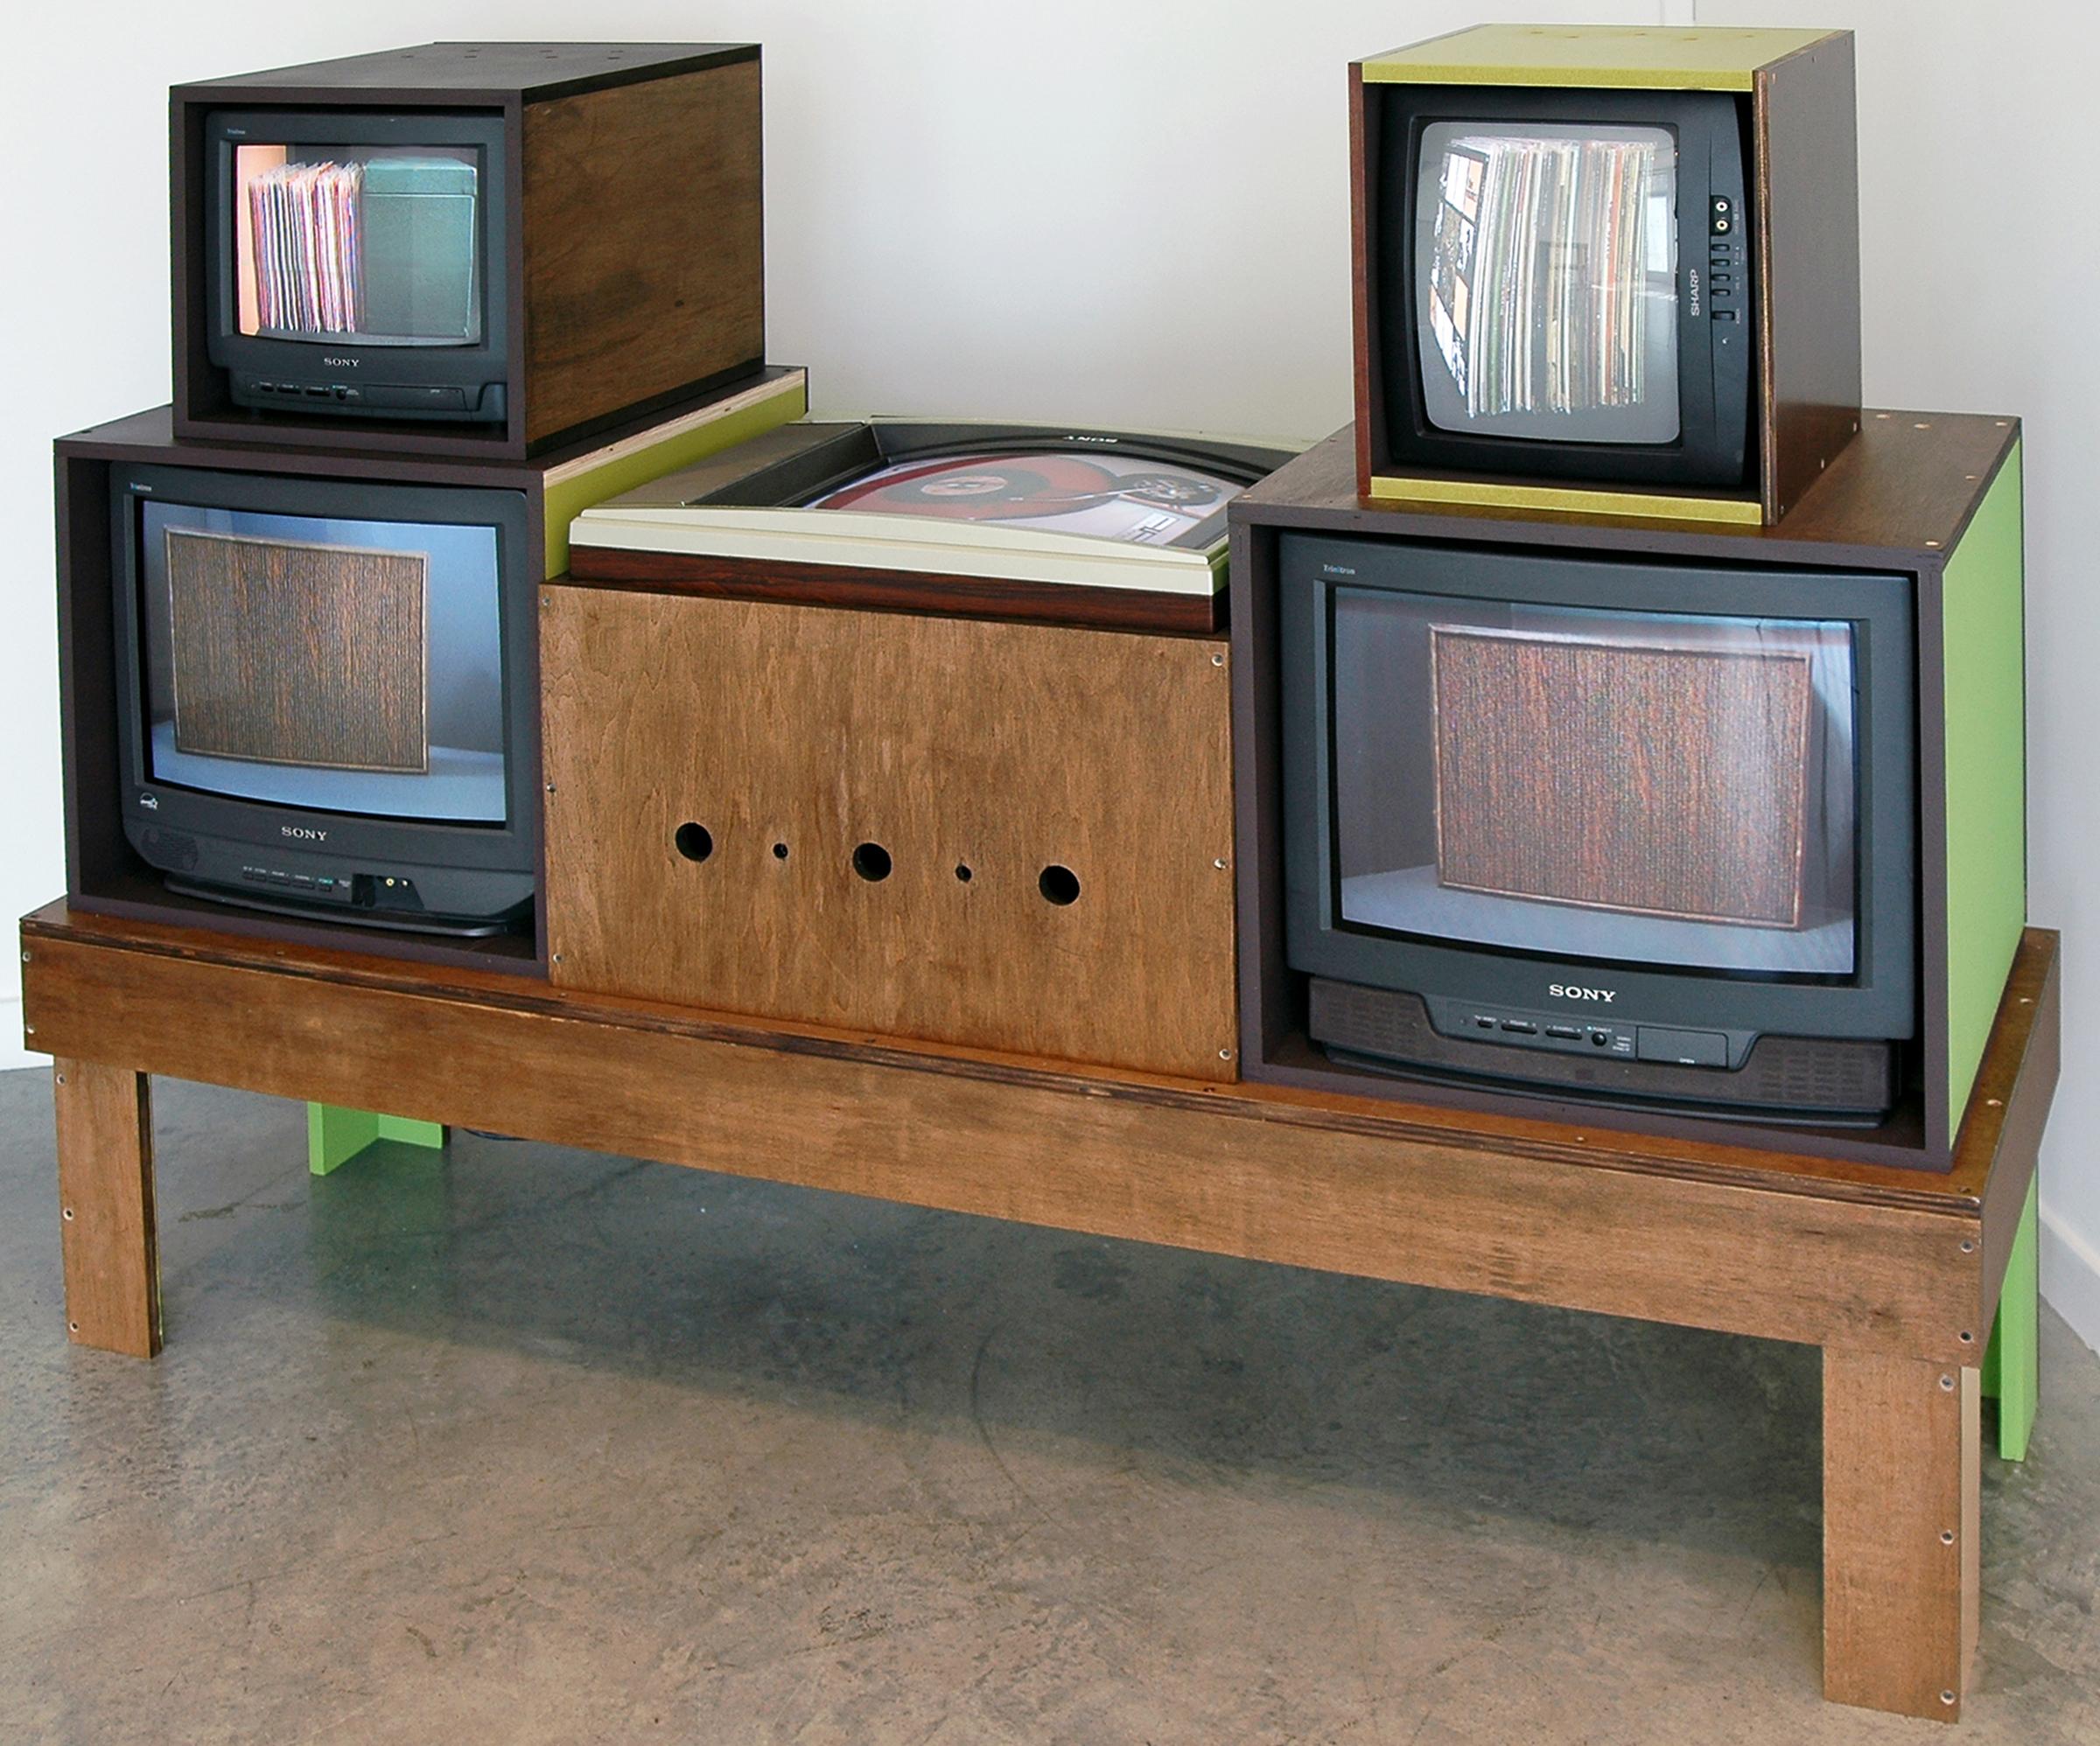 "JOSHUA PIEPER   Video Stereo , CRT monitors, RF modulators, DVD players, plywood and paint, 54"" x 72"" x 22"", 2012"